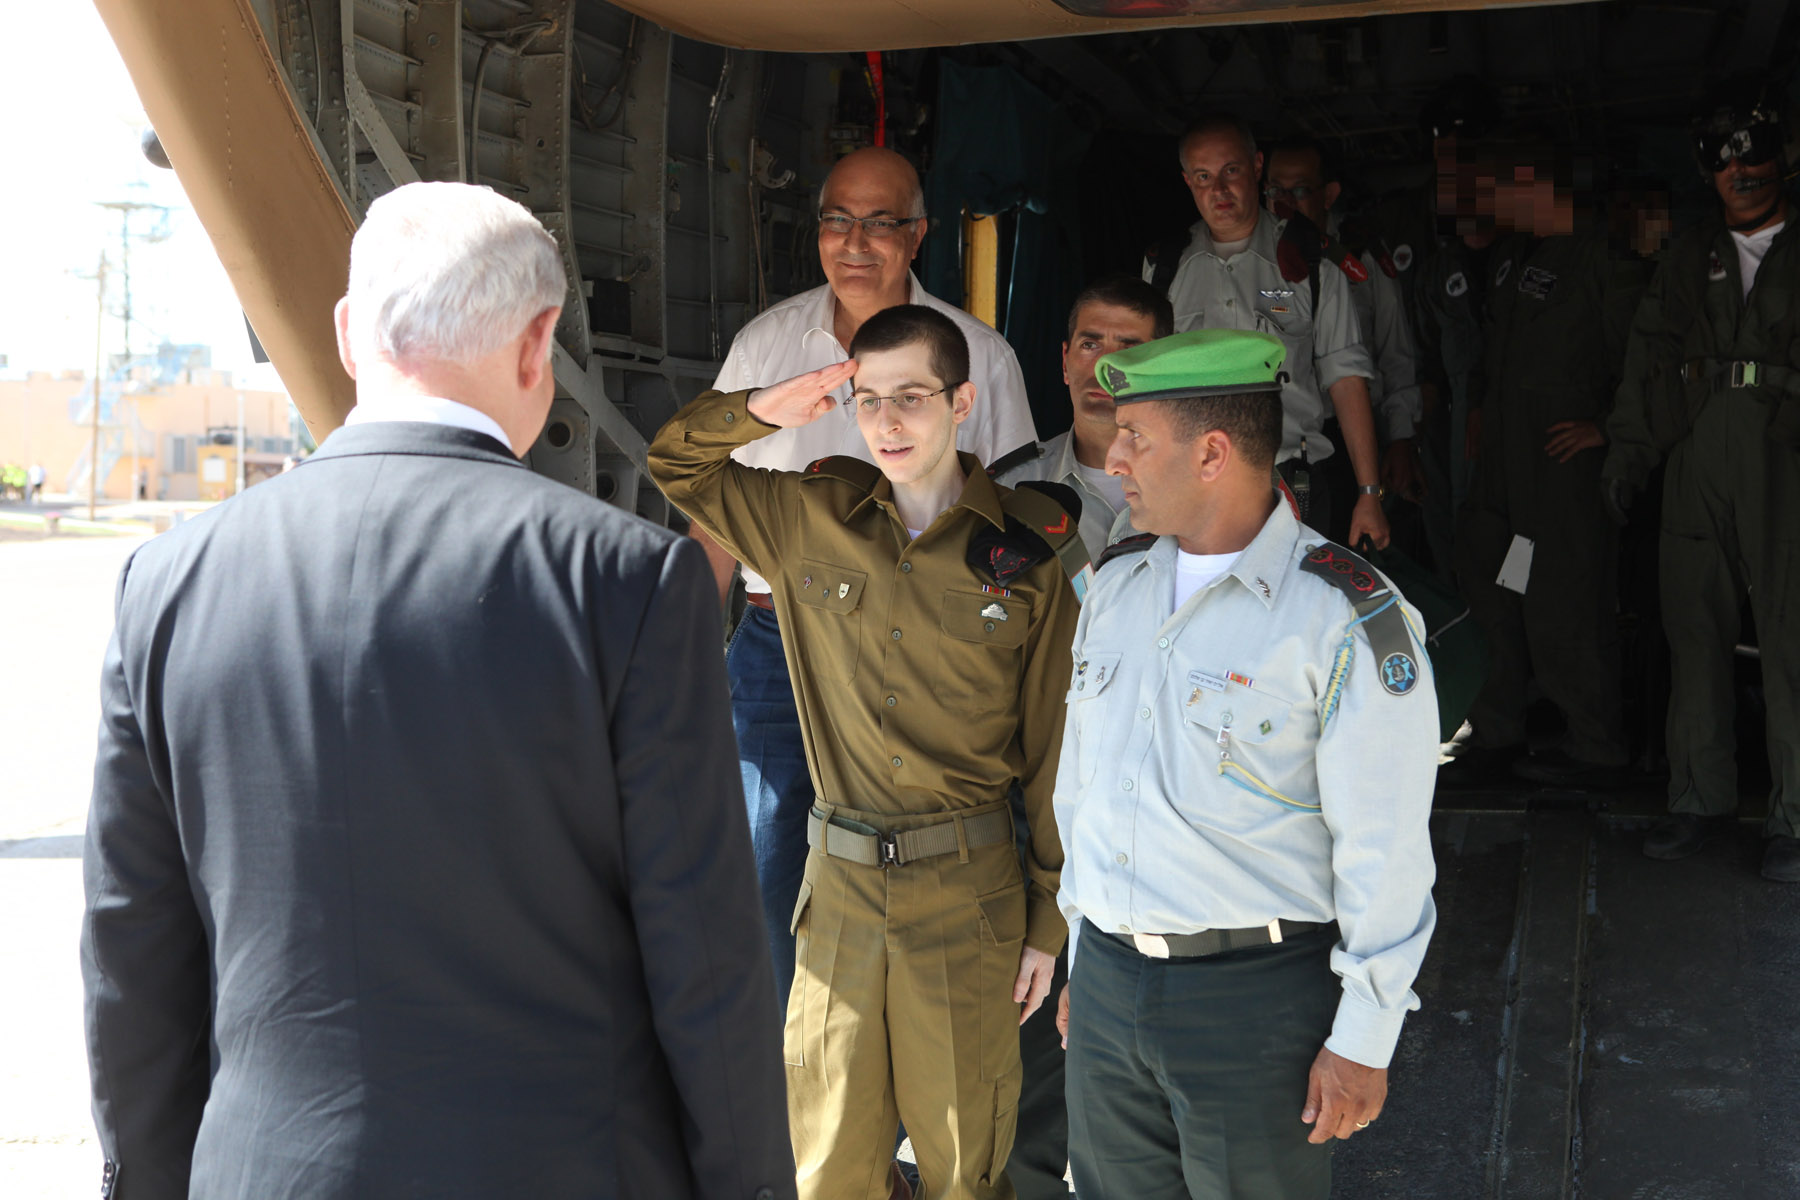 File:Flickr - Israel Defense Forces - Gilad Shalit Salutes Israel Prime  Minister Benjamin Netanyahu.jpg - Wikimedia Commons